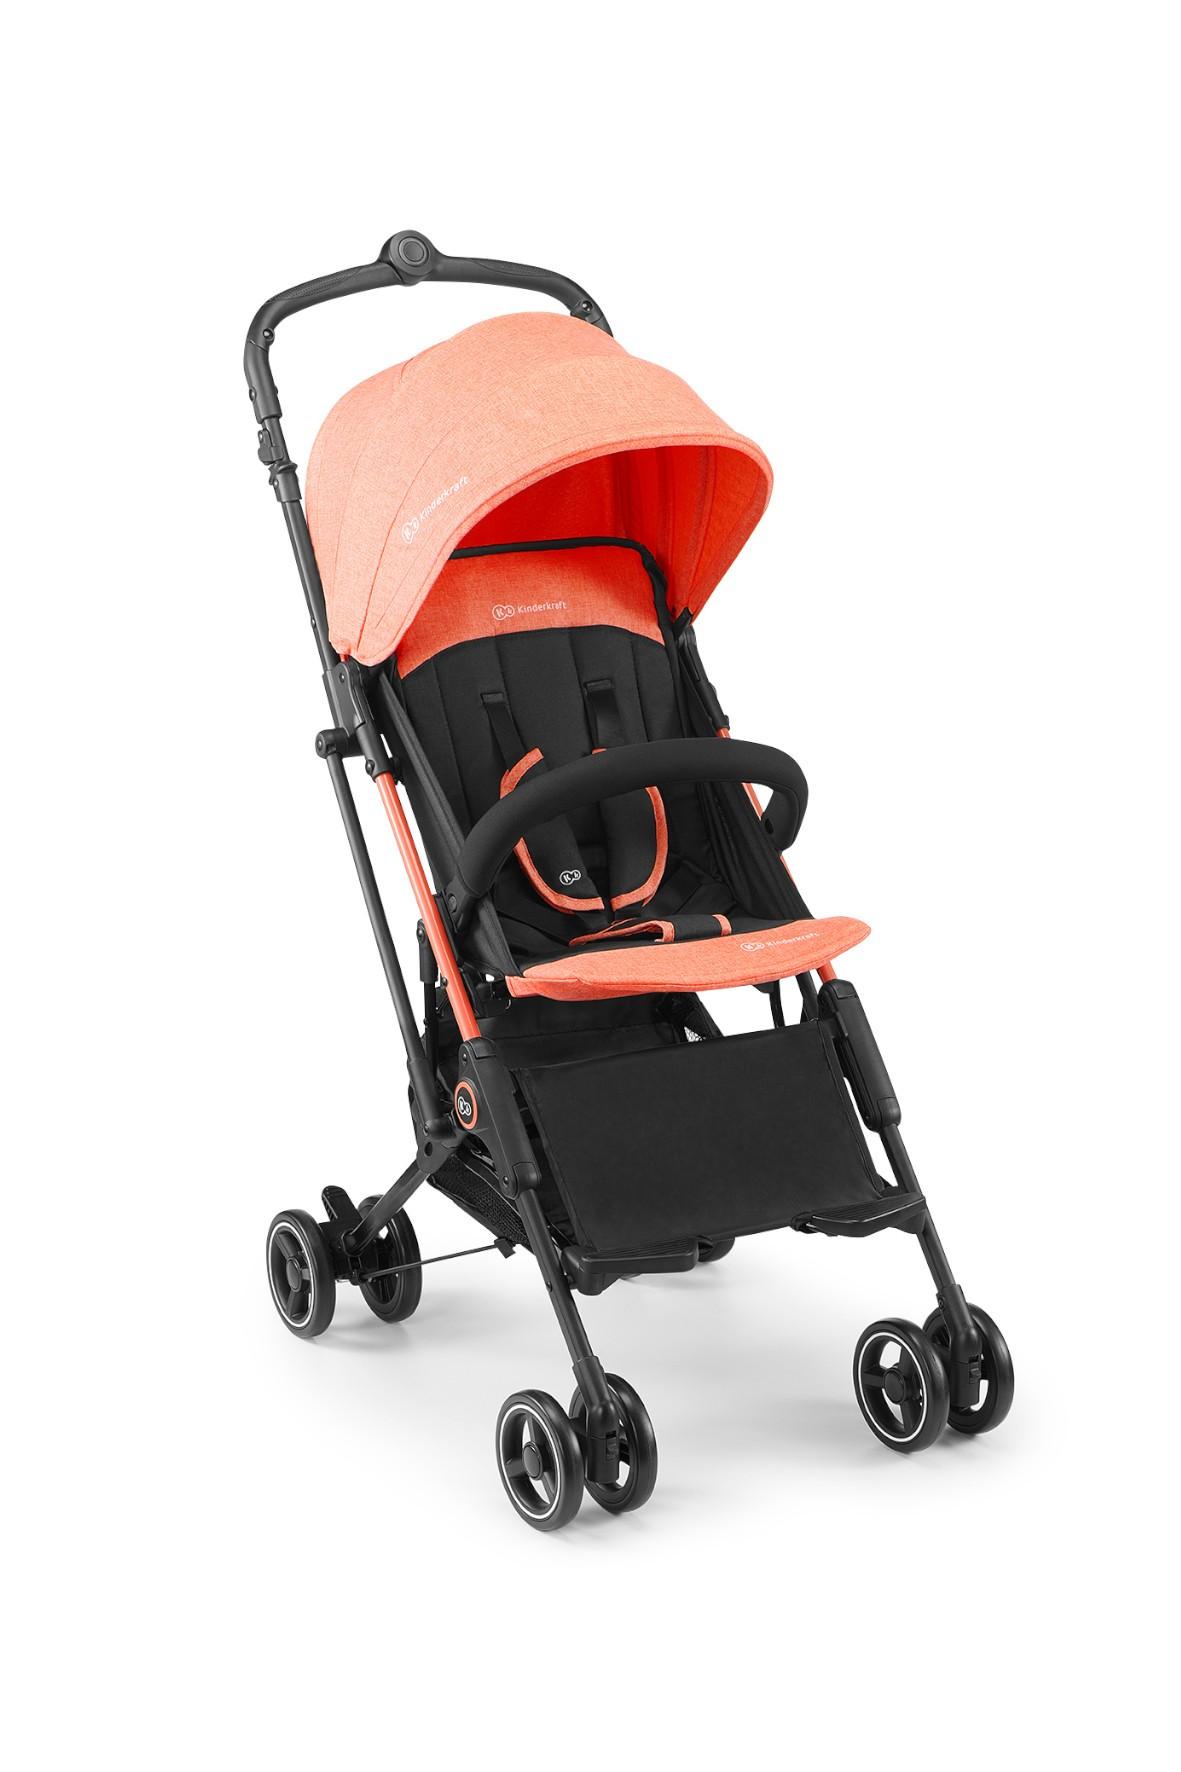 Wózek spacerowy Mini Dot Kinderkraft koral 0-15kg